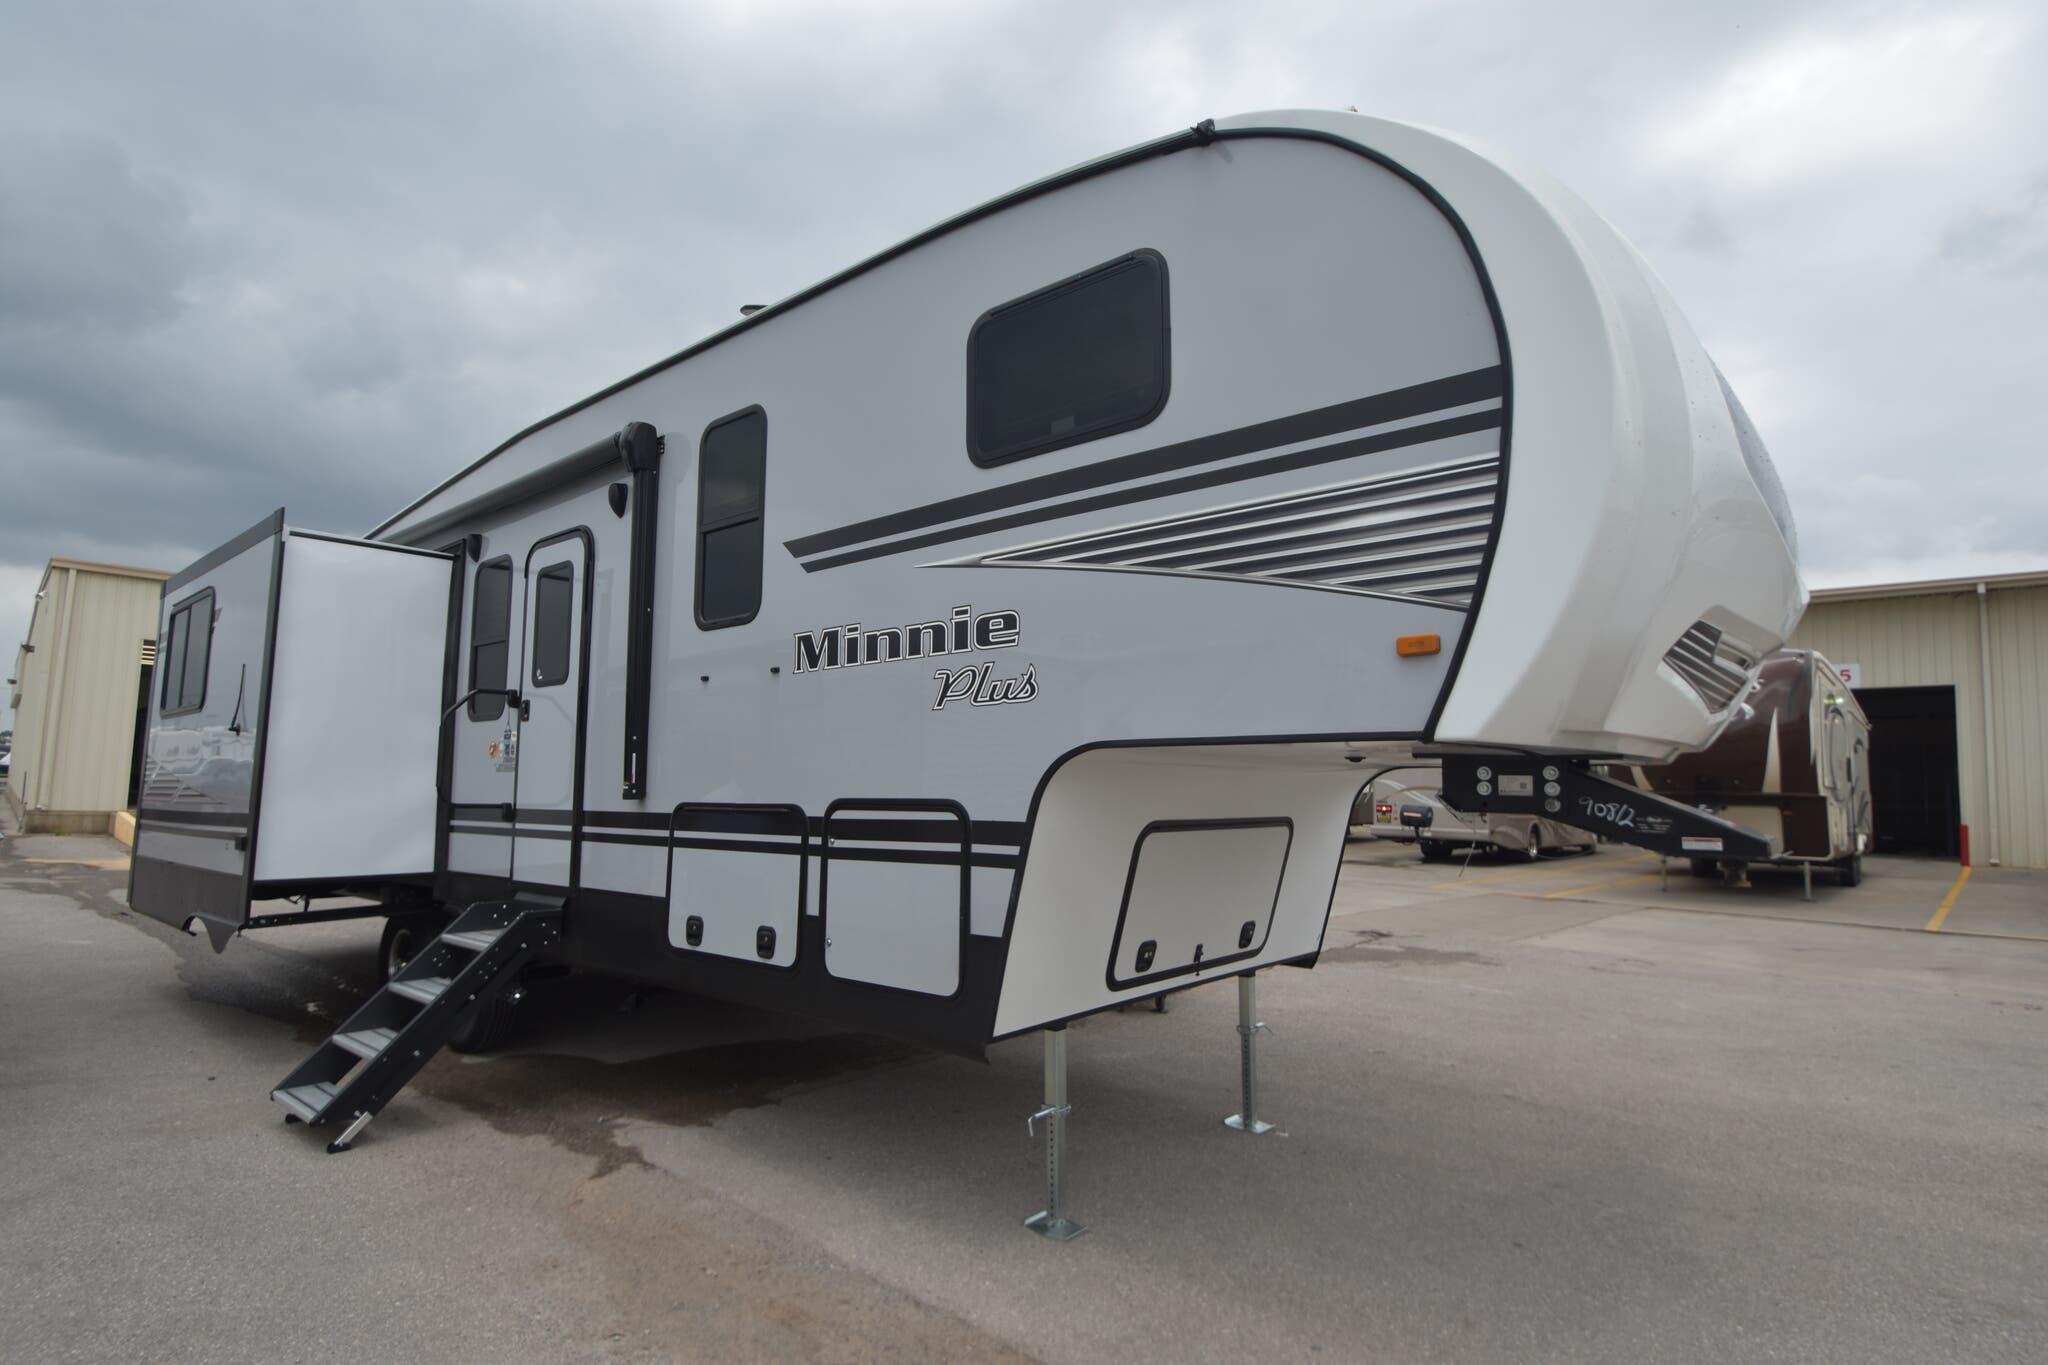 90812 - 2020 Winnebago Minnie Plus 29MBH Fifth Wheel for sale in